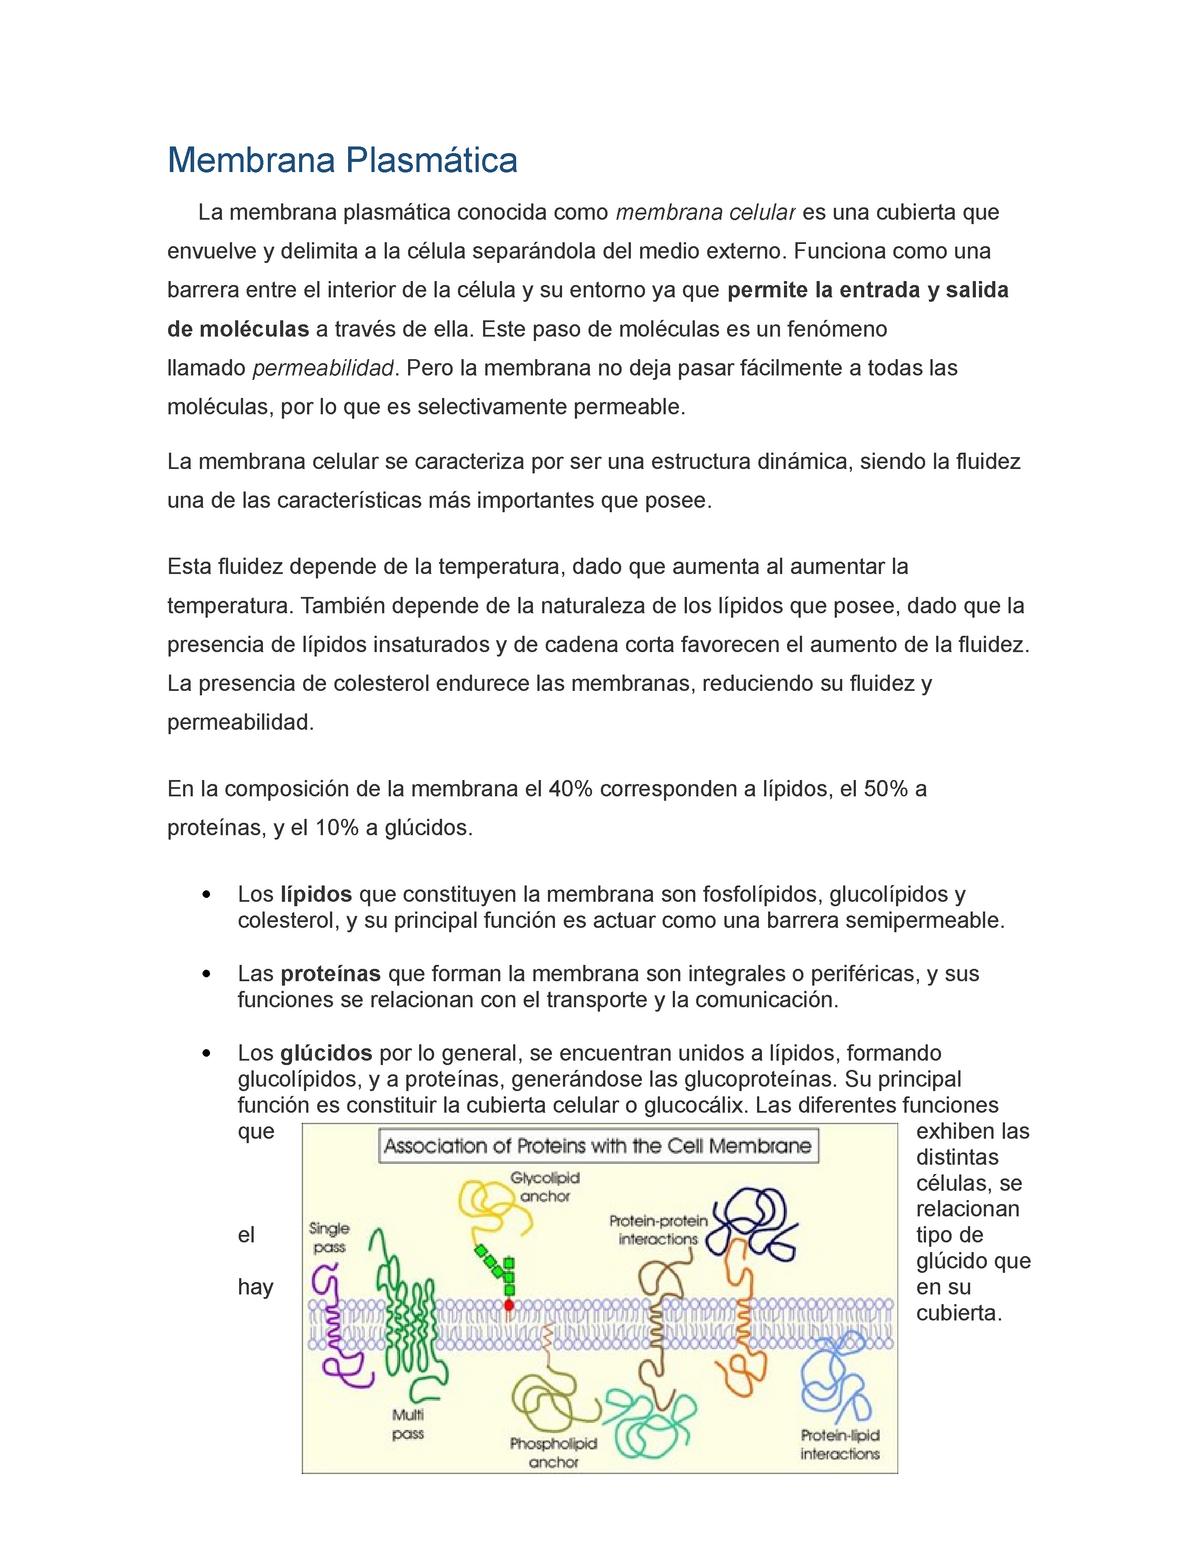 Membrana Plasmática Biologia T1015 Uvm Studocu